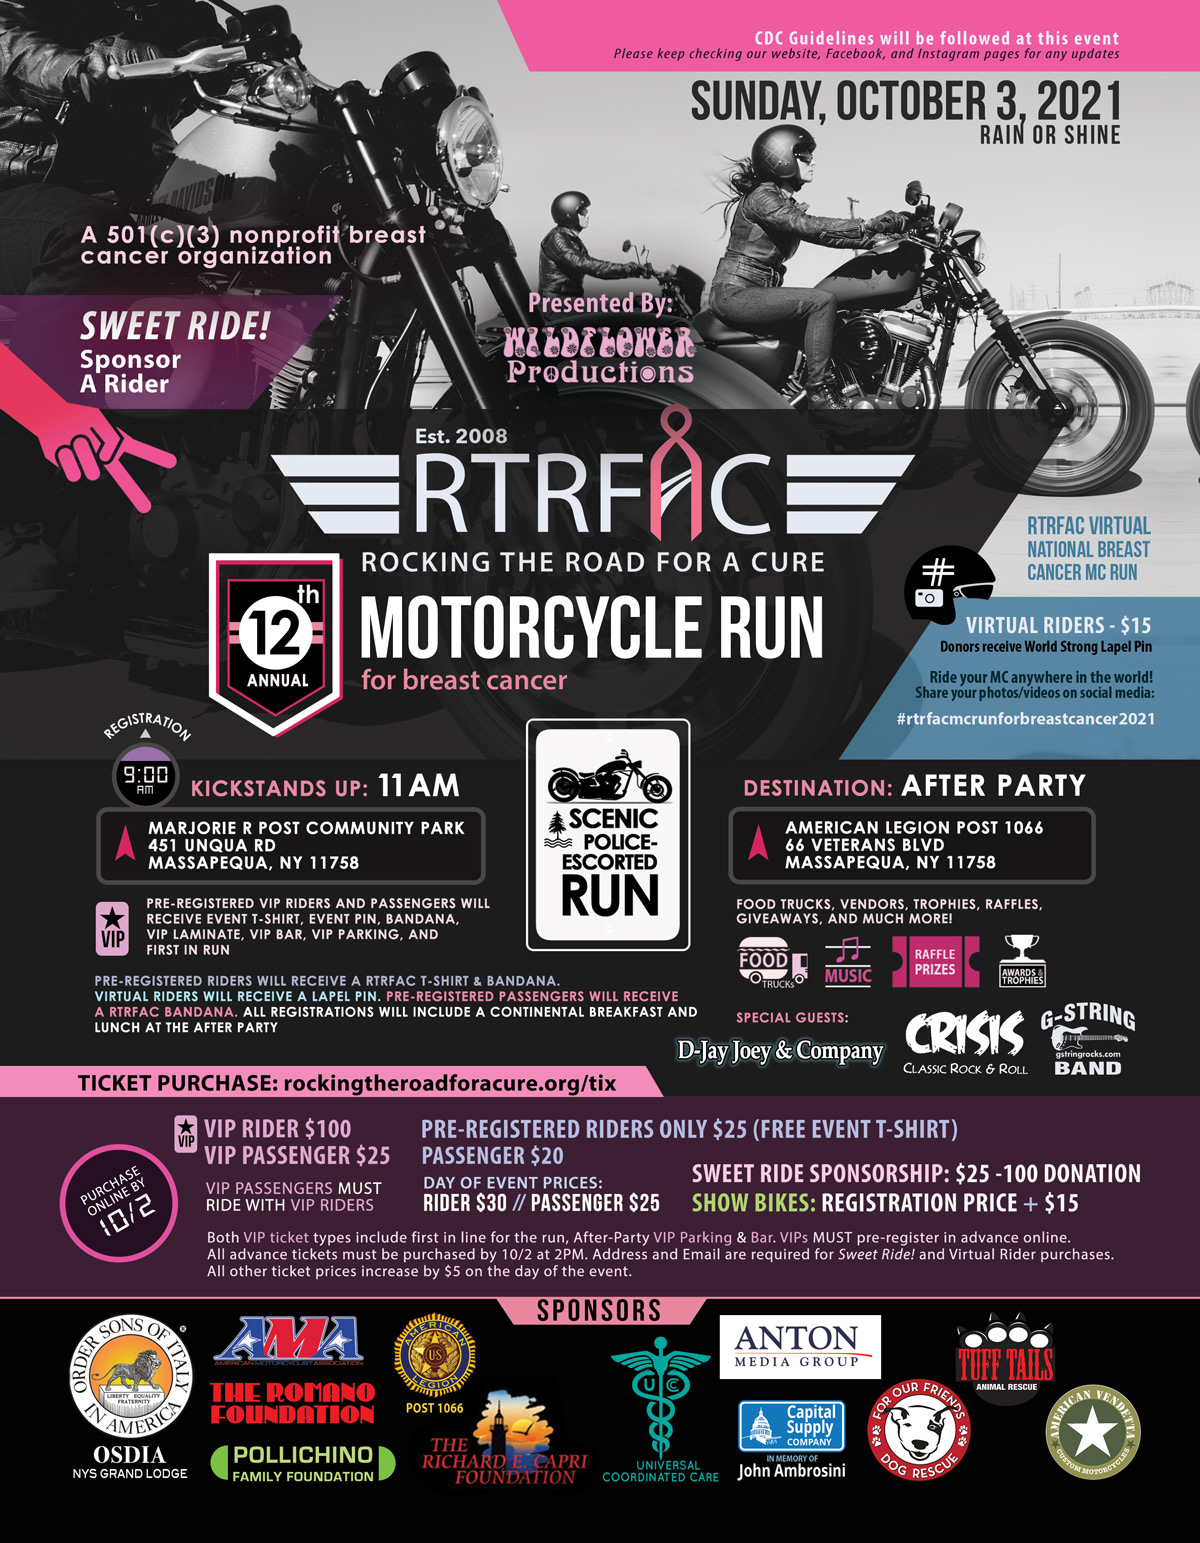 12th Annual Motorcycle Run for breast cancer - Long Island - Marjorie J Community Park - MC Run - American Legion Post 1066 - Massapequa NY